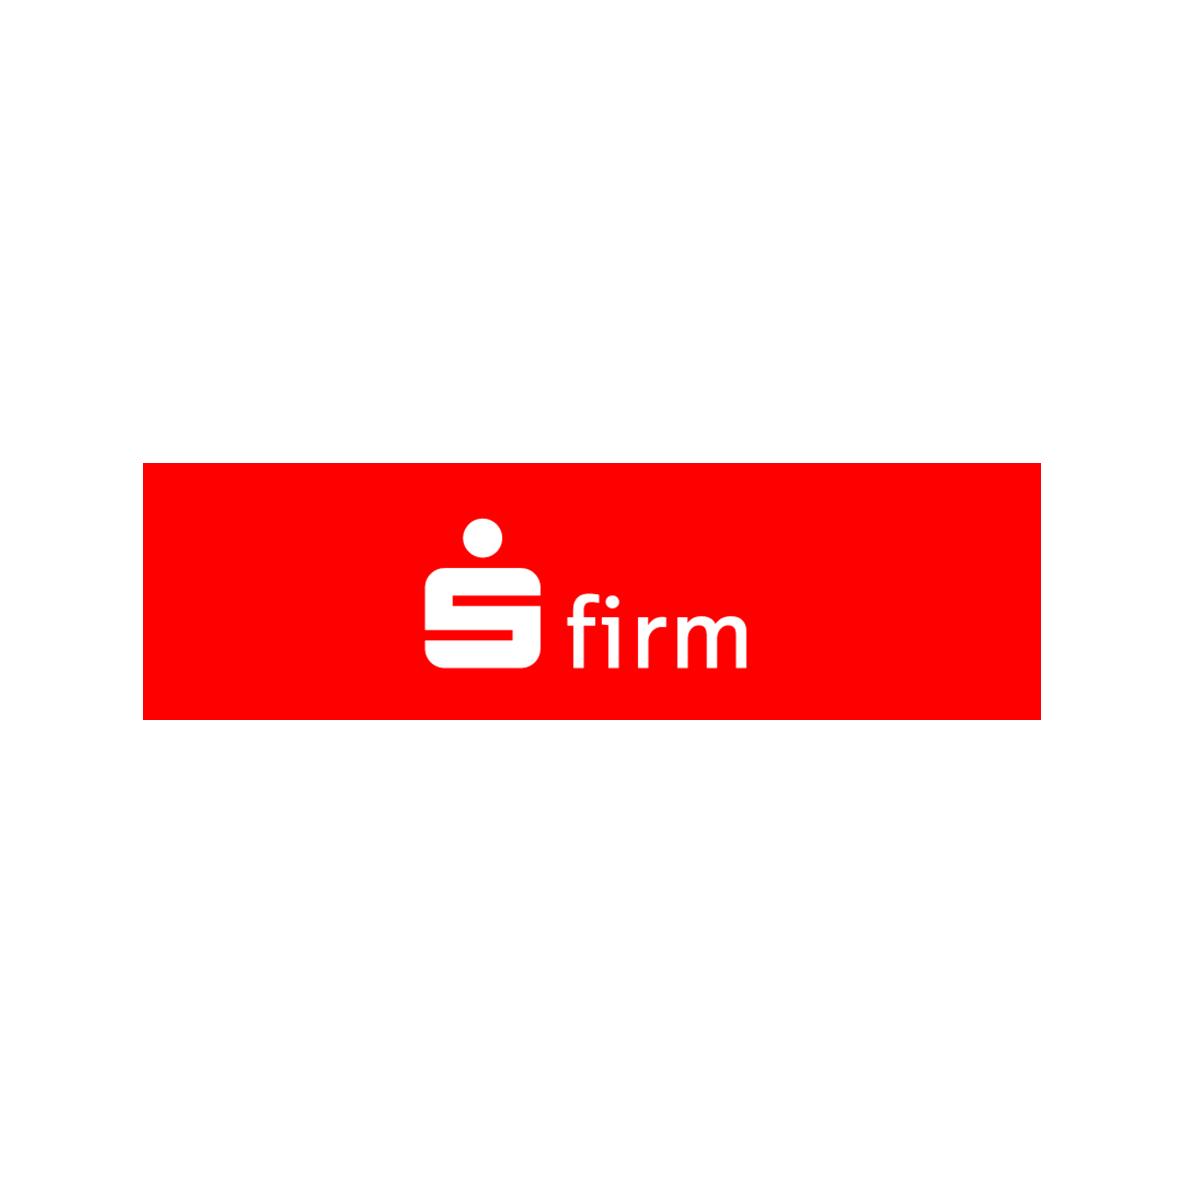 SFirm kachel - Schnittstellen